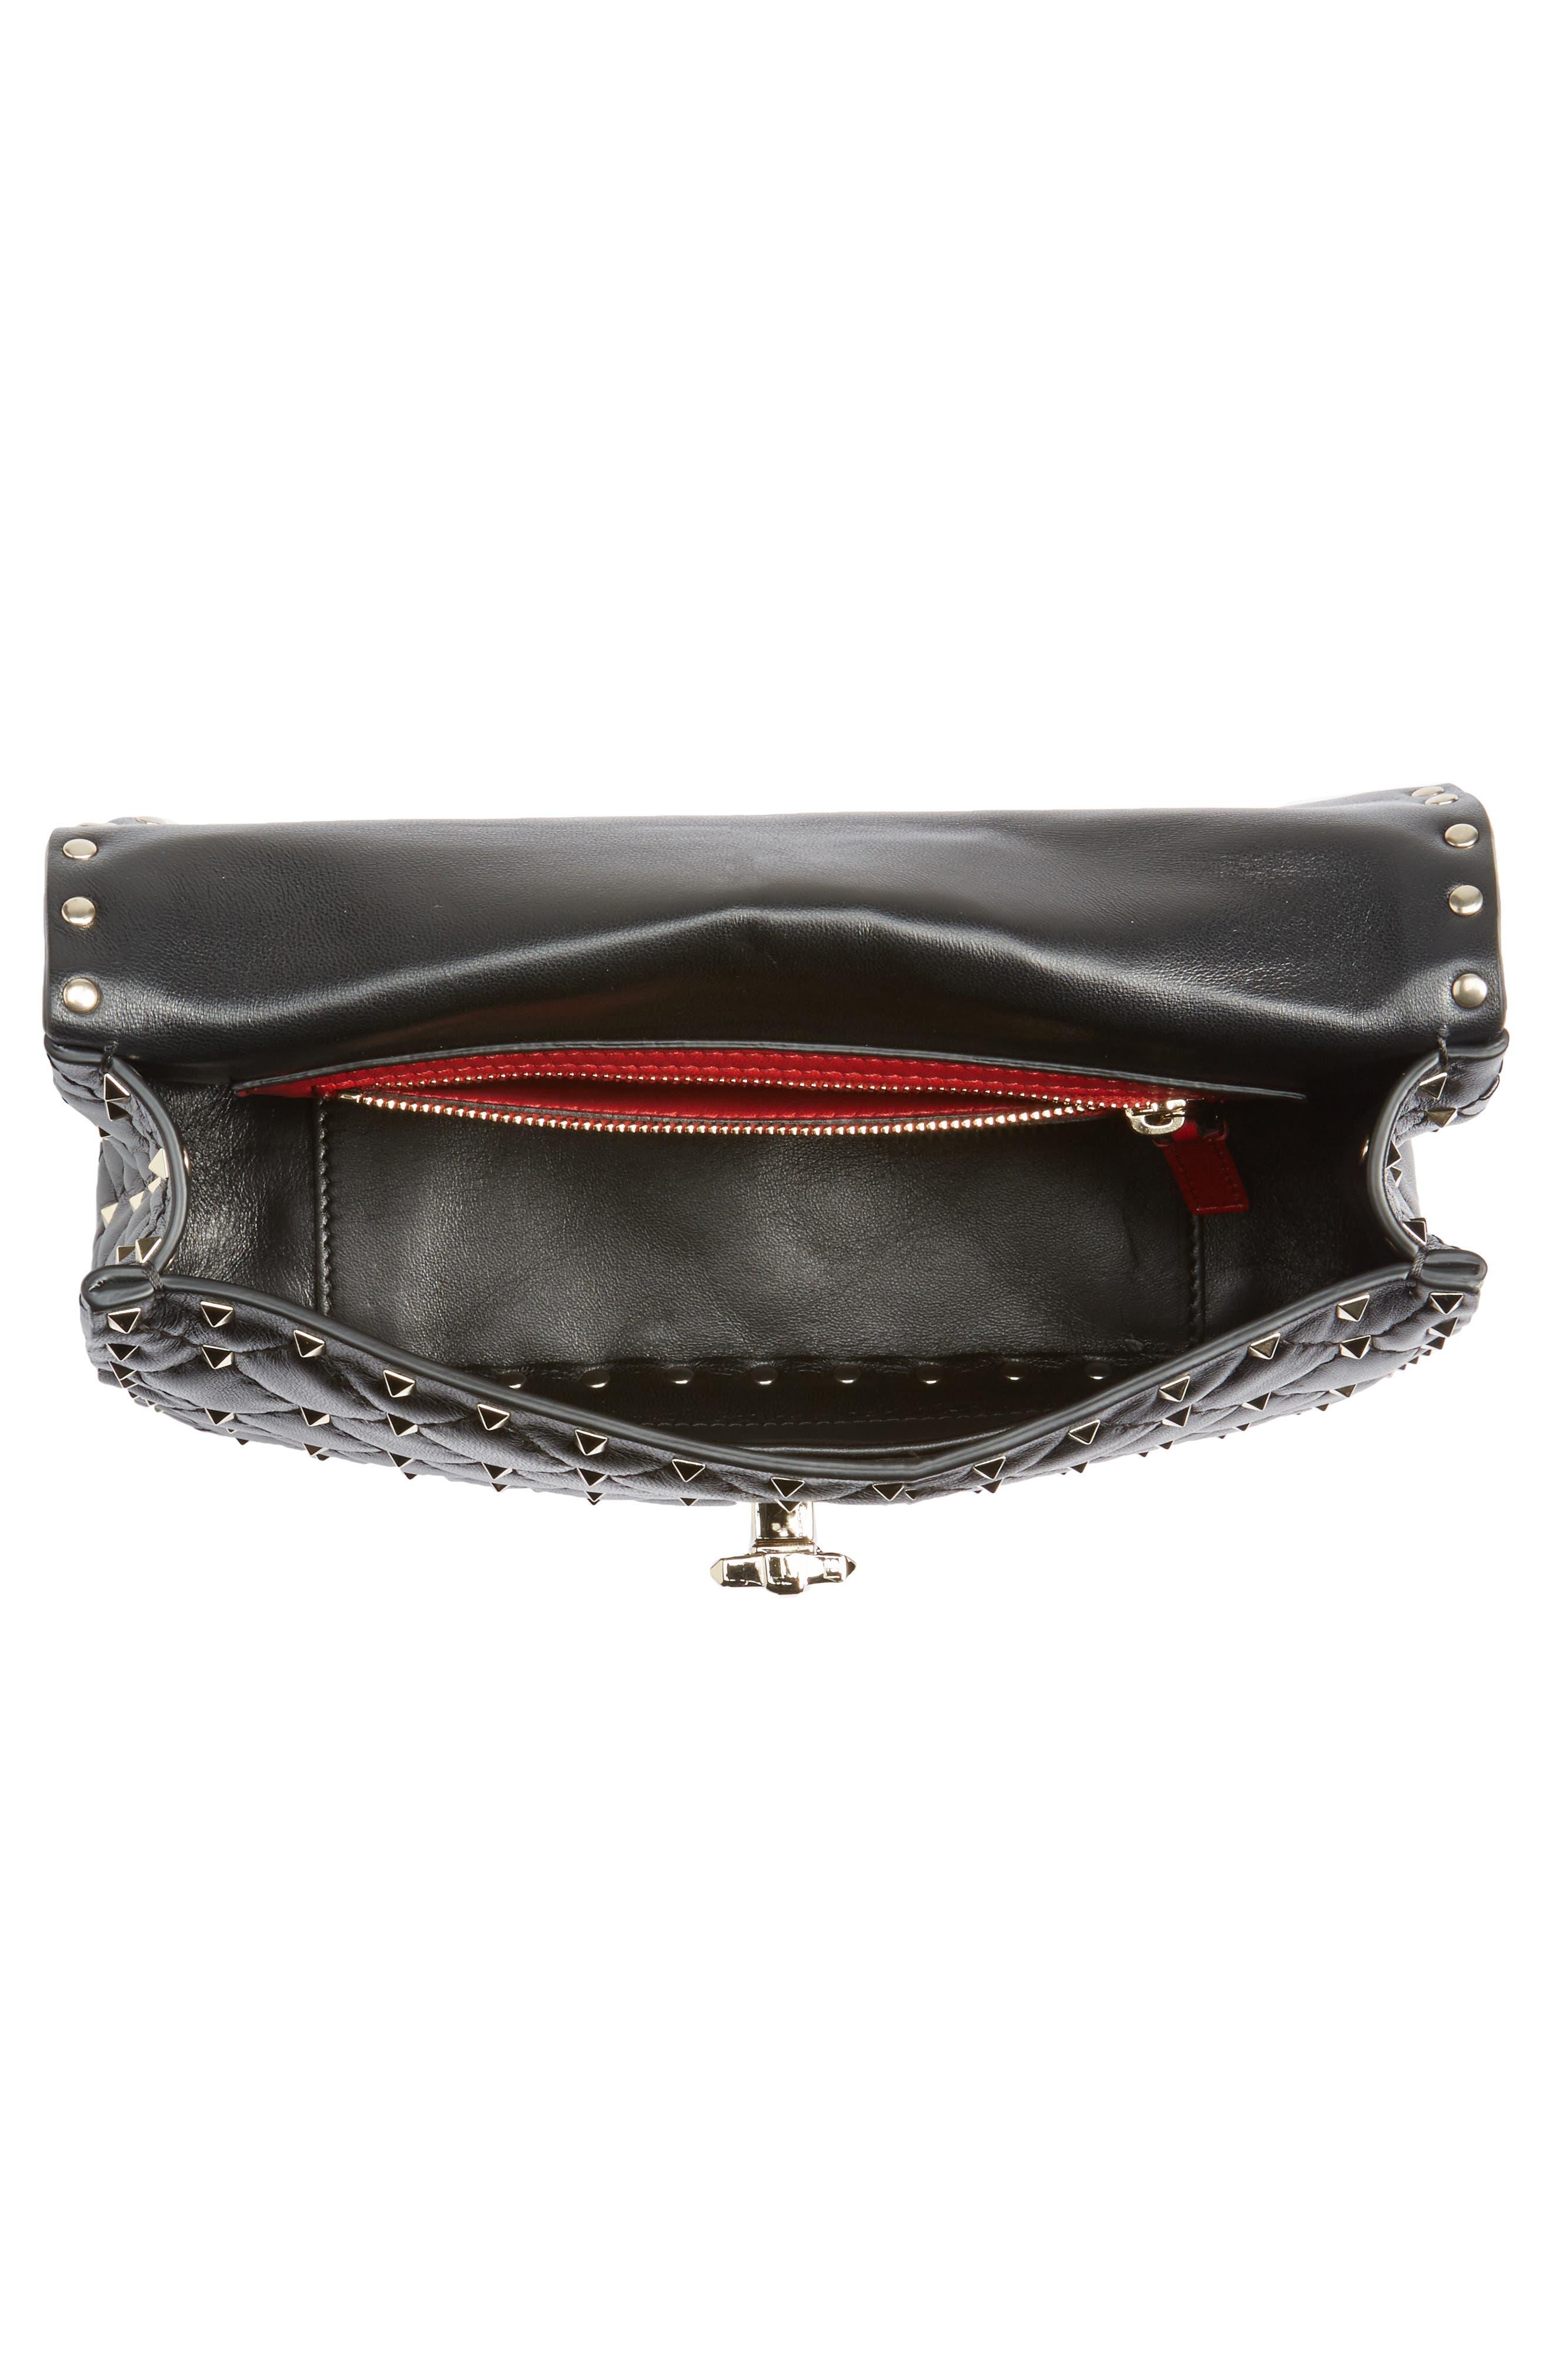 Medium Rockstud Matelassé Quilted Leather Shoulder Bag,                             Alternate thumbnail 4, color,                             BLACK